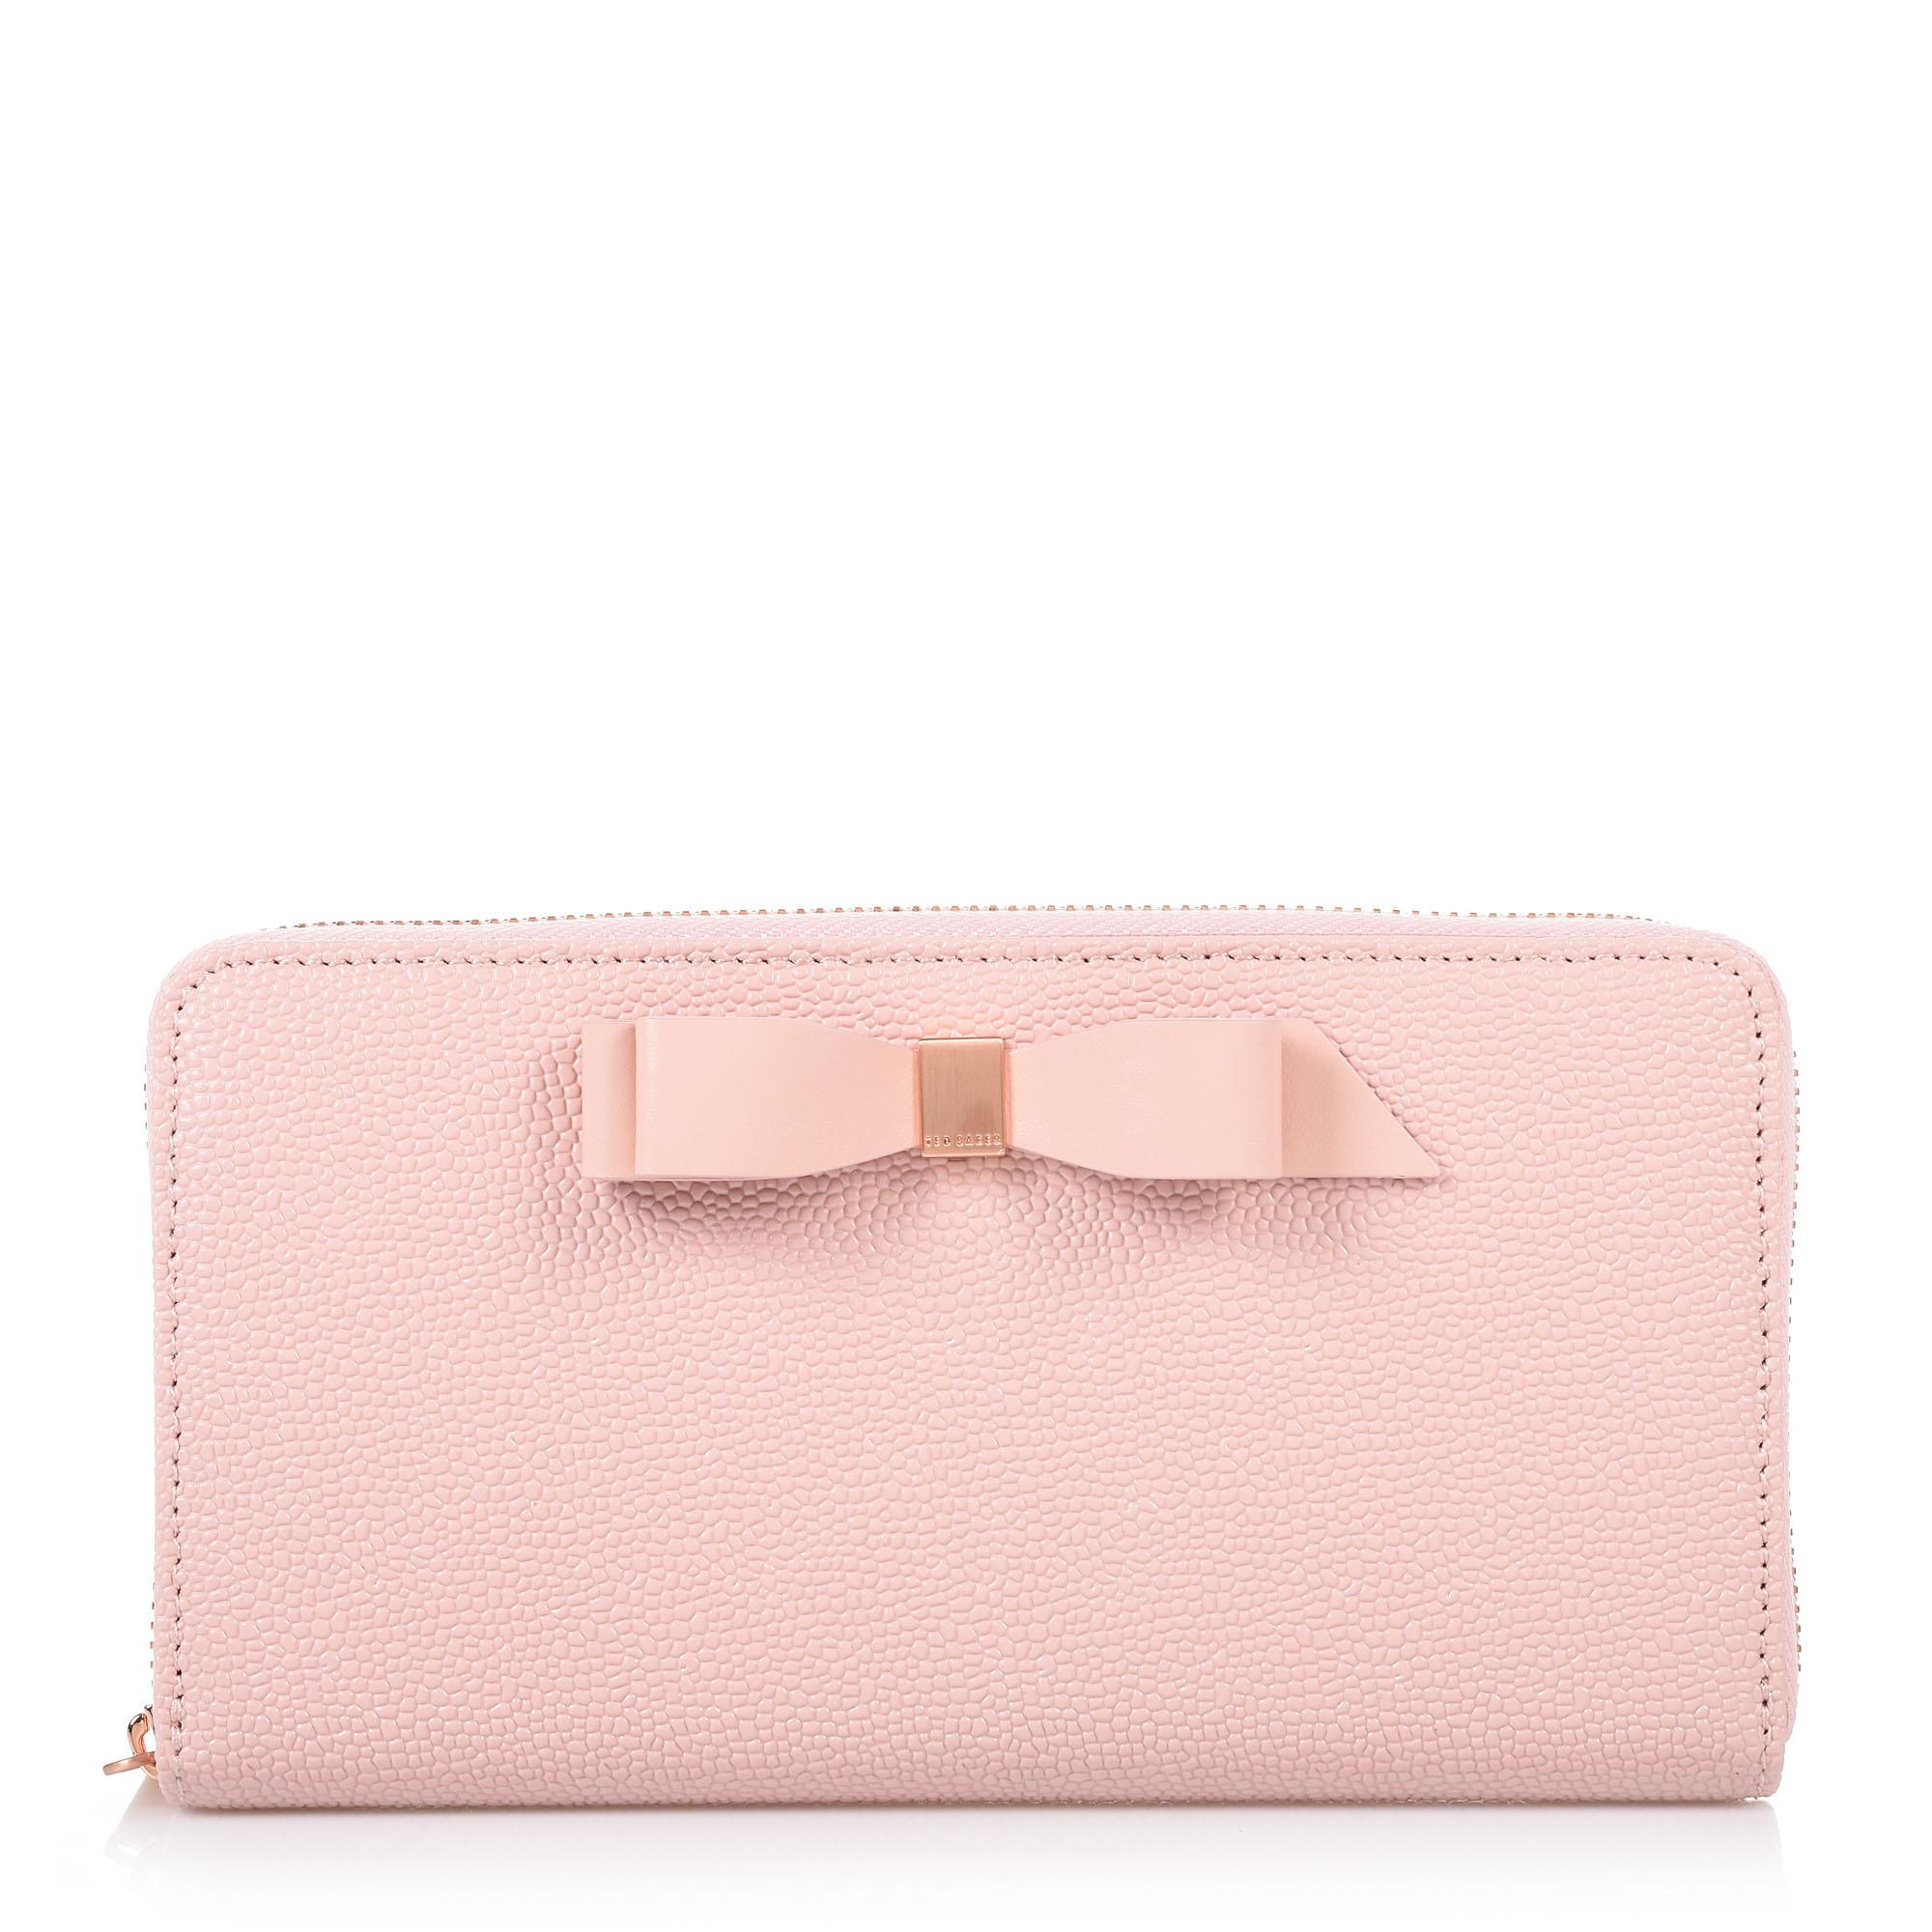 Brand Bags Δερμάτινο Πορτοφόλι Κασετίνα Ted Baker Bow Zip Around Marinee  150982 9bd911b2eaa